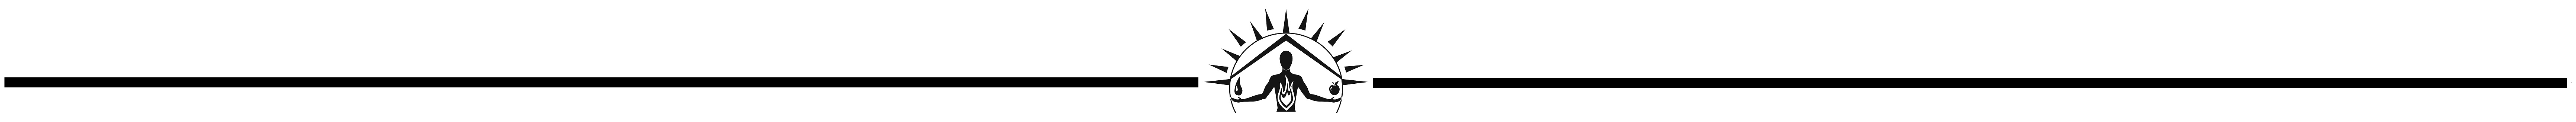 Solar Powered Survival Trailer